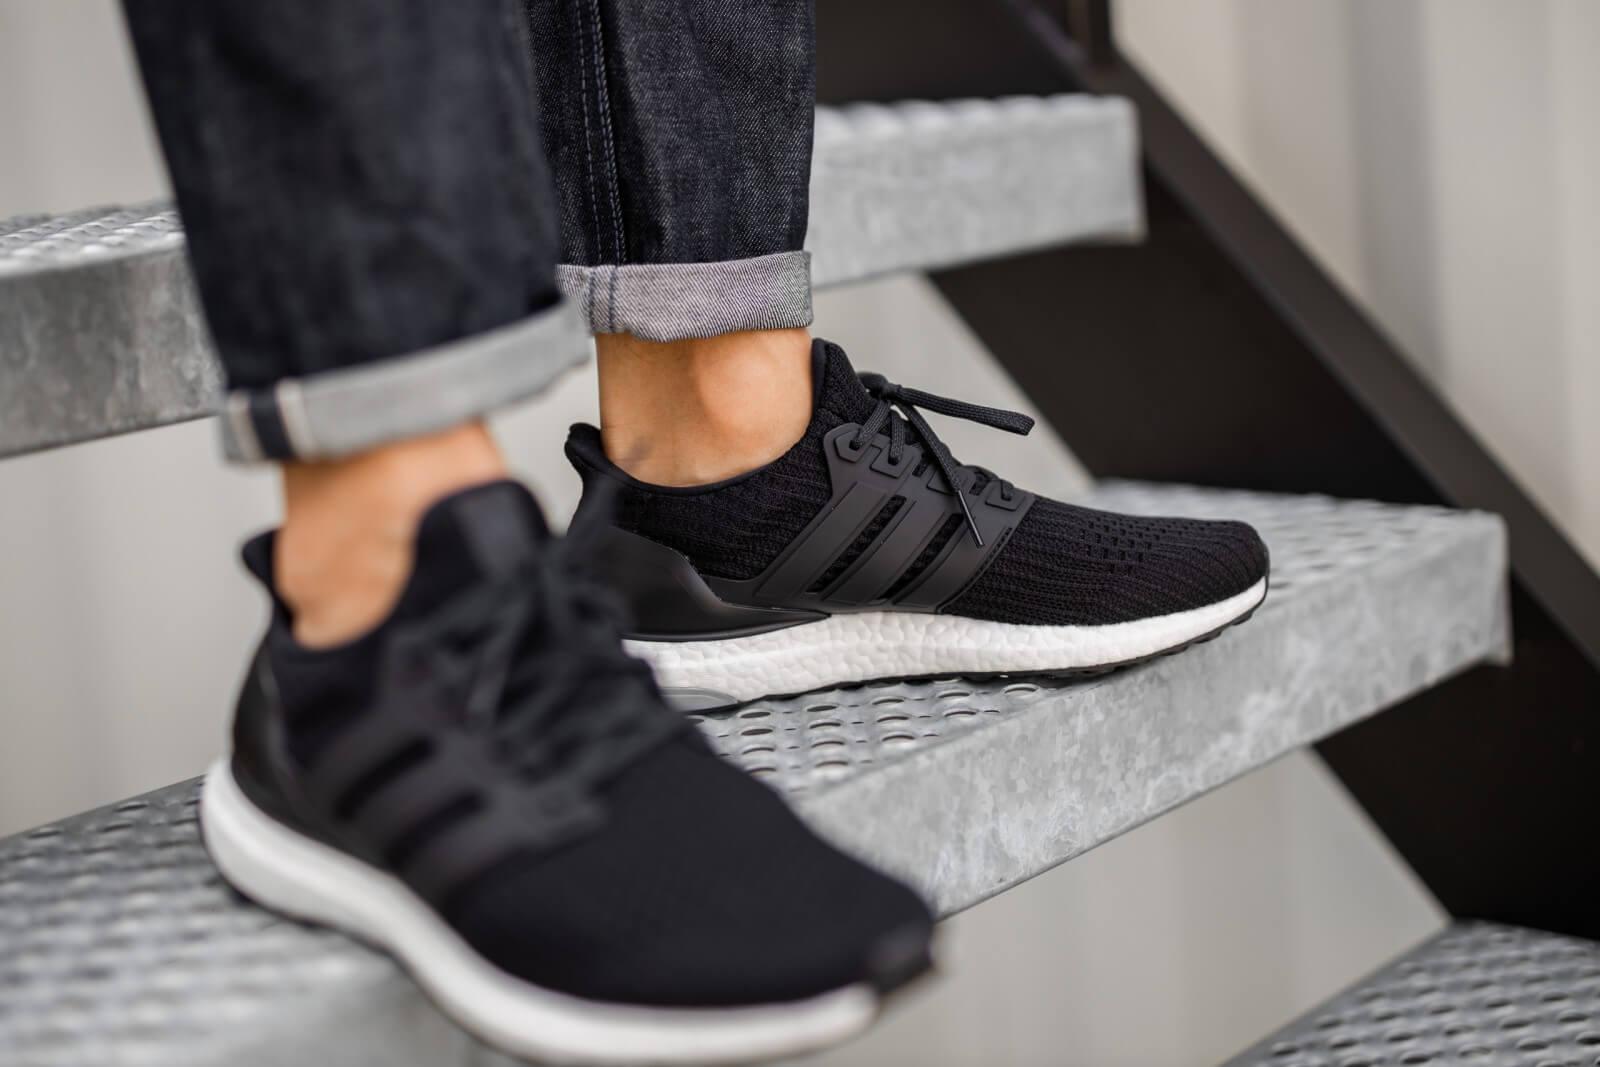 Adidas UltraBoost 4.0 Core Black/White